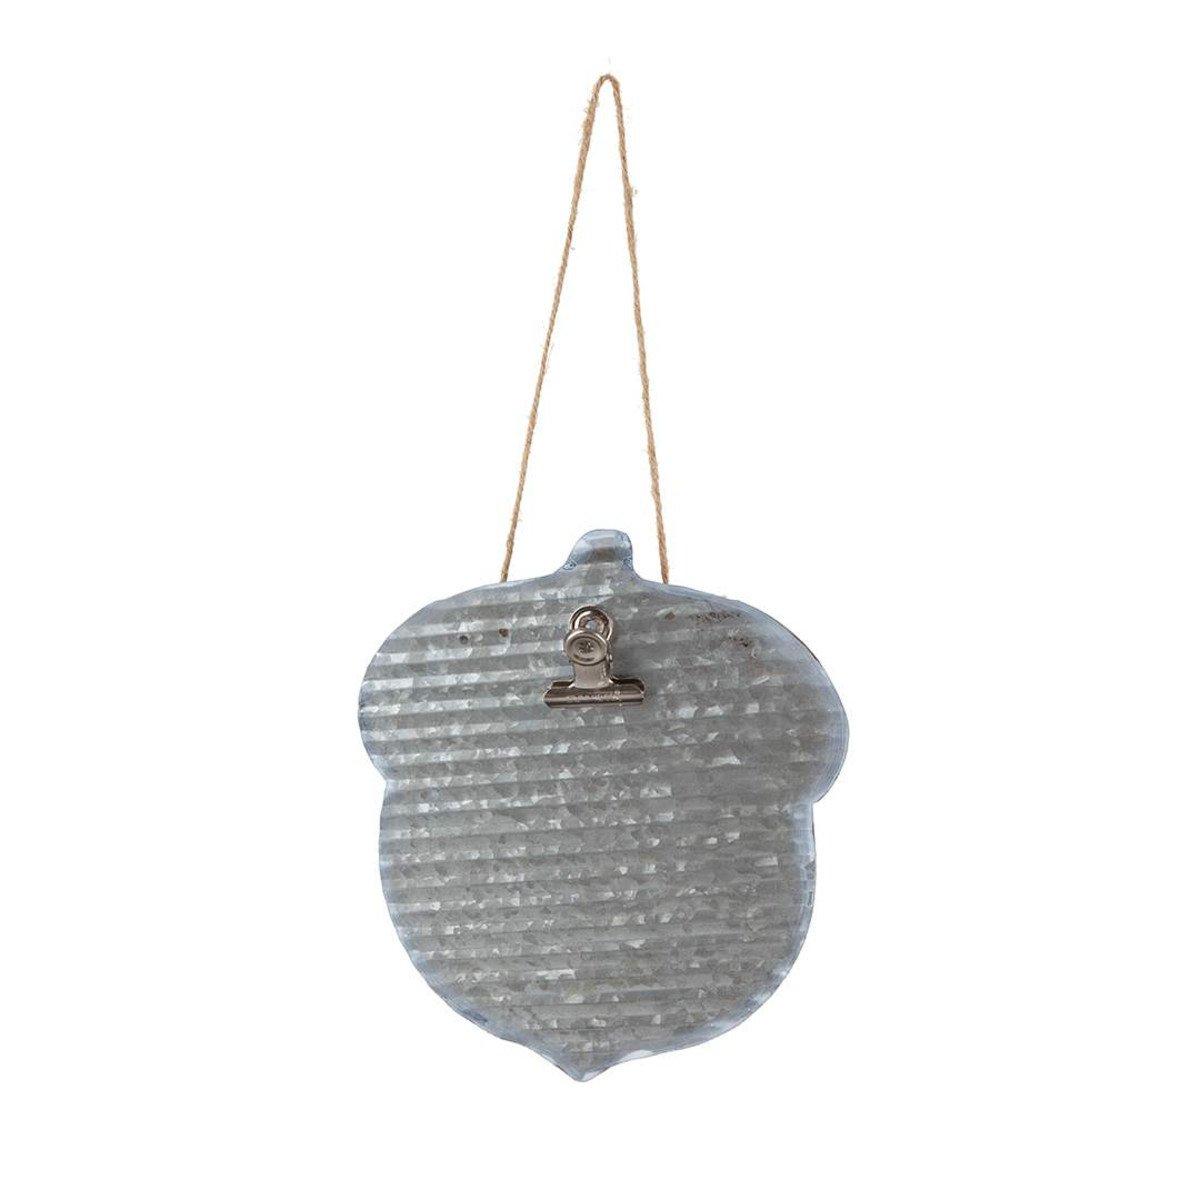 Stacy West | Buttermilk Basin Acorn Metal Hanger  STM-20376